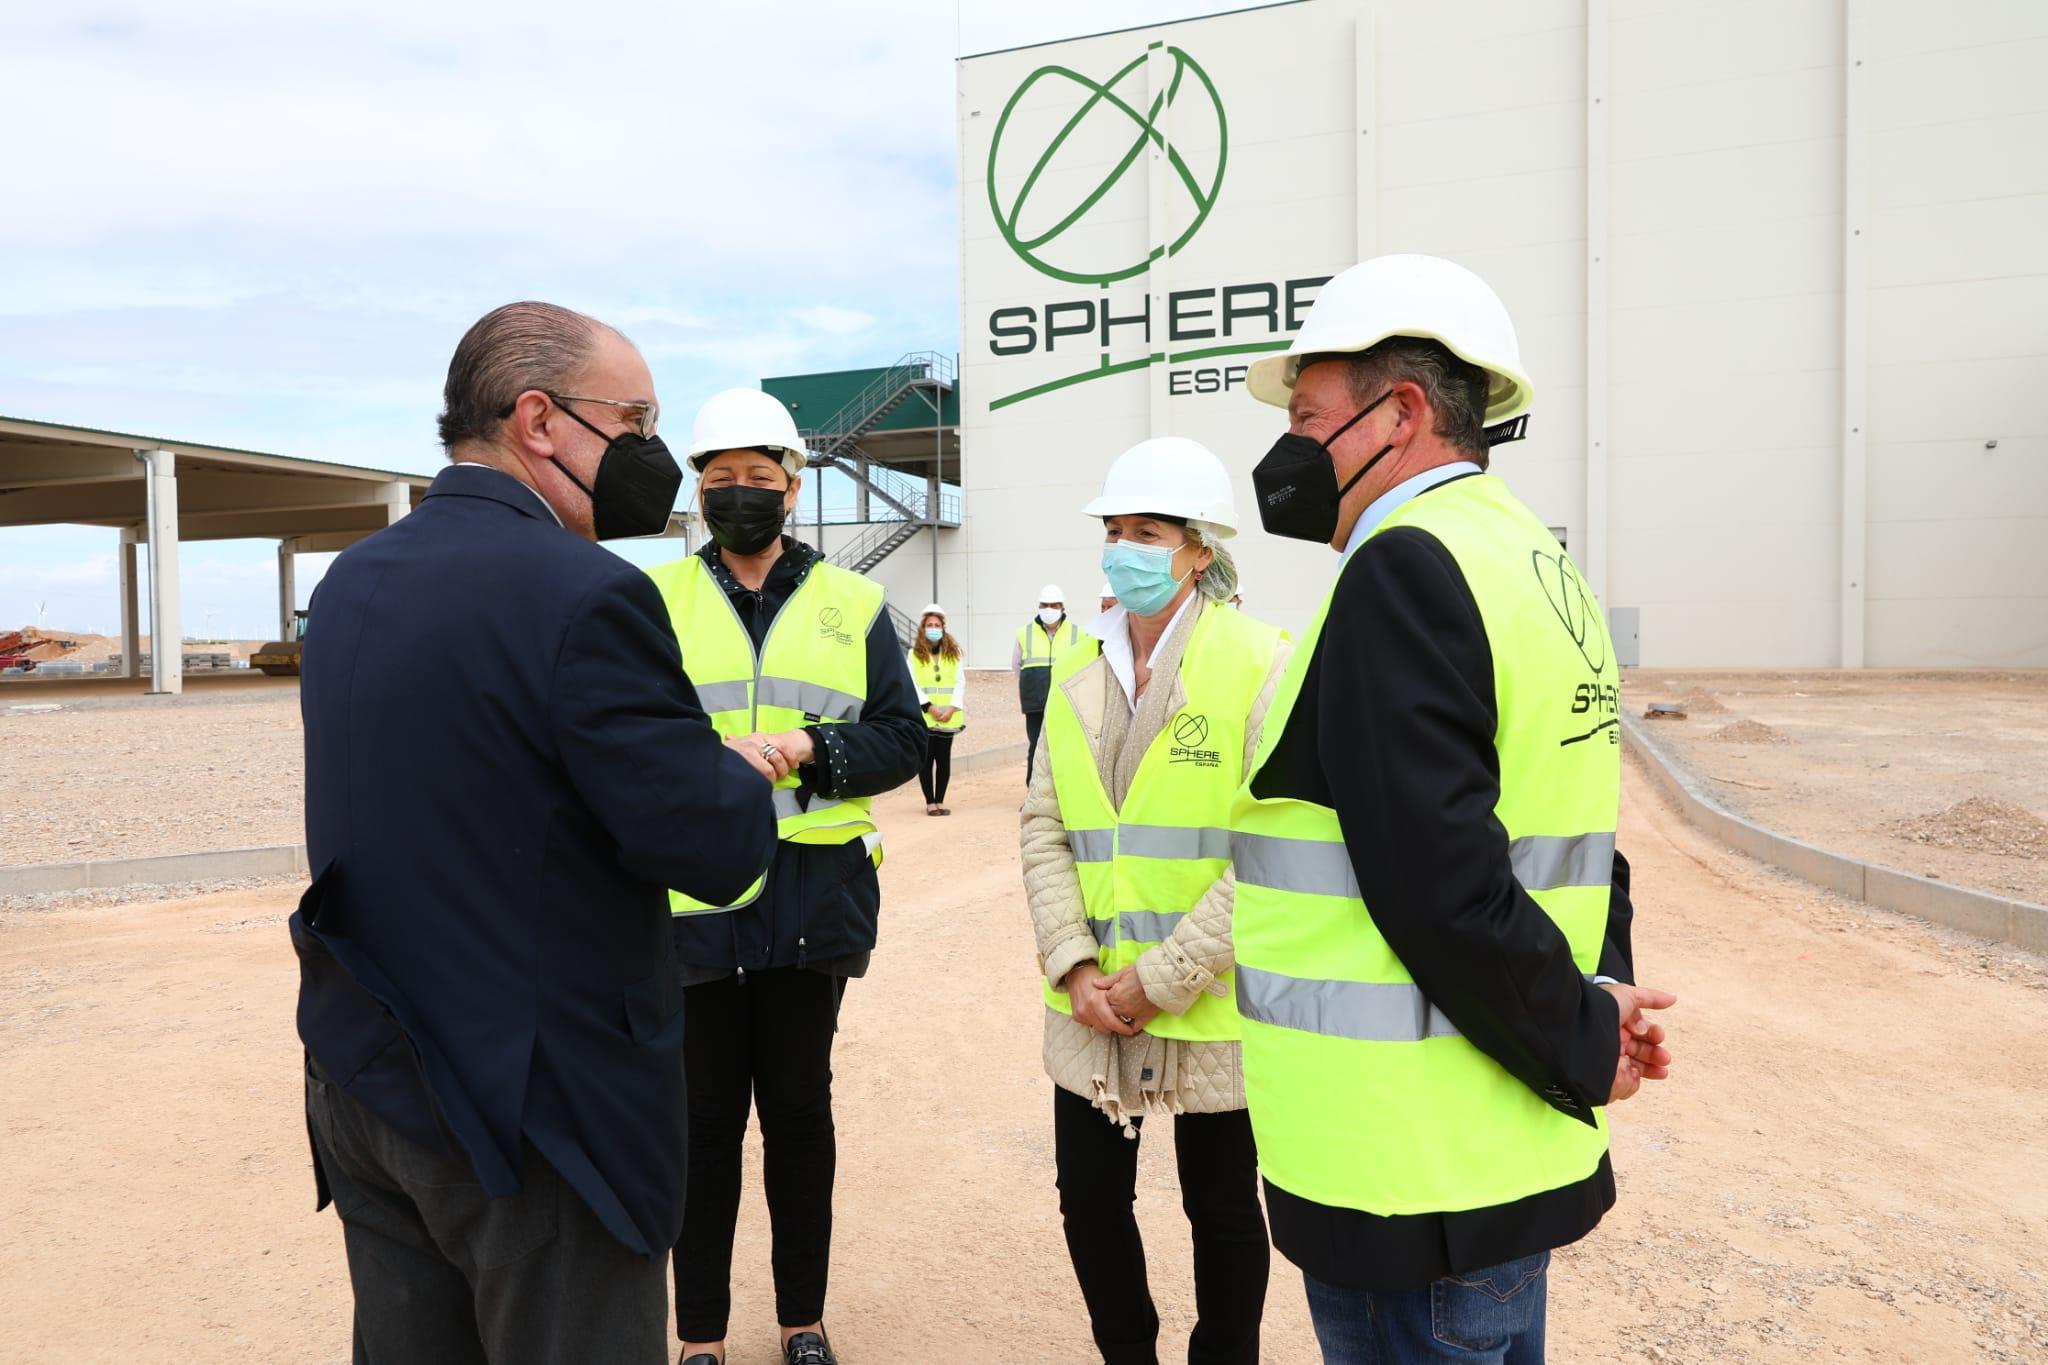 Visita a la empresa Sphere Spain